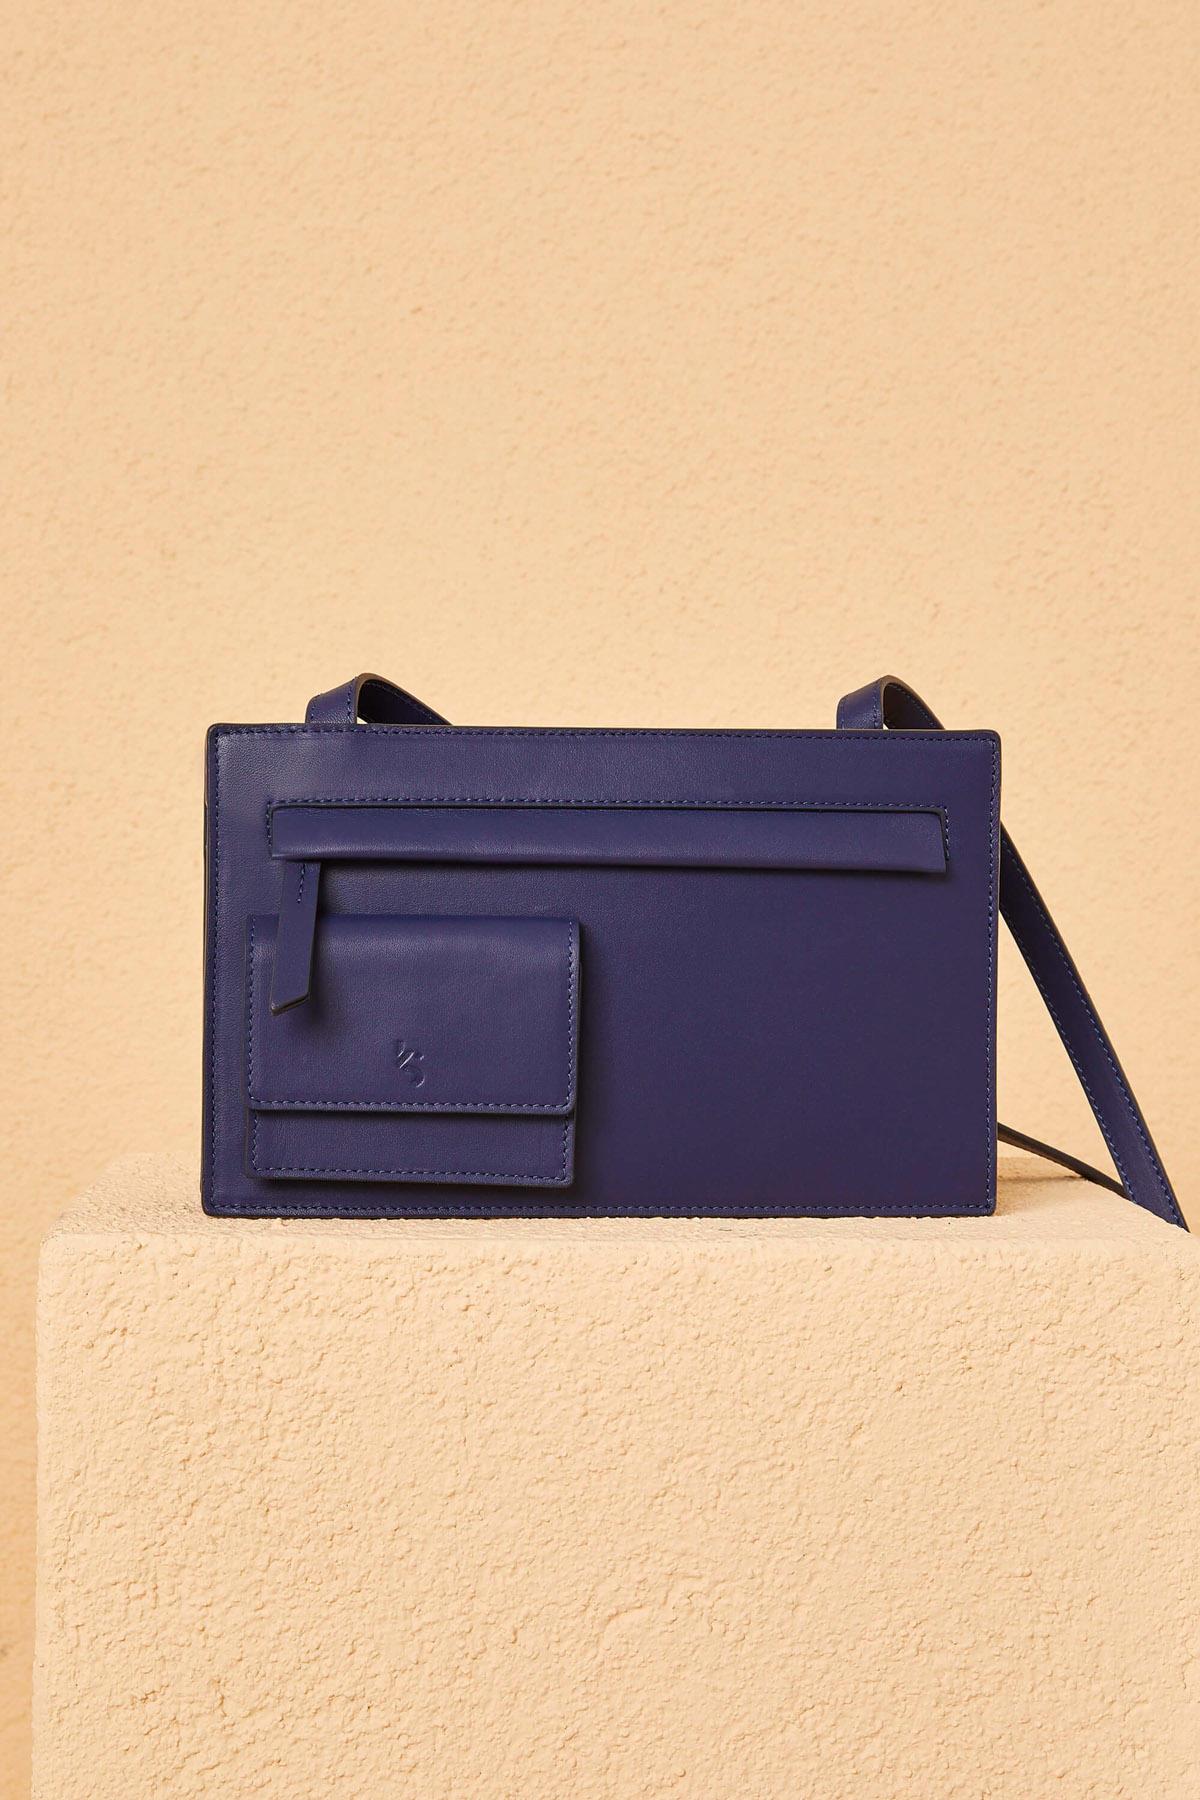 Kevser Sarıoğlu - BAG WITH POCKET NAVY BLUE